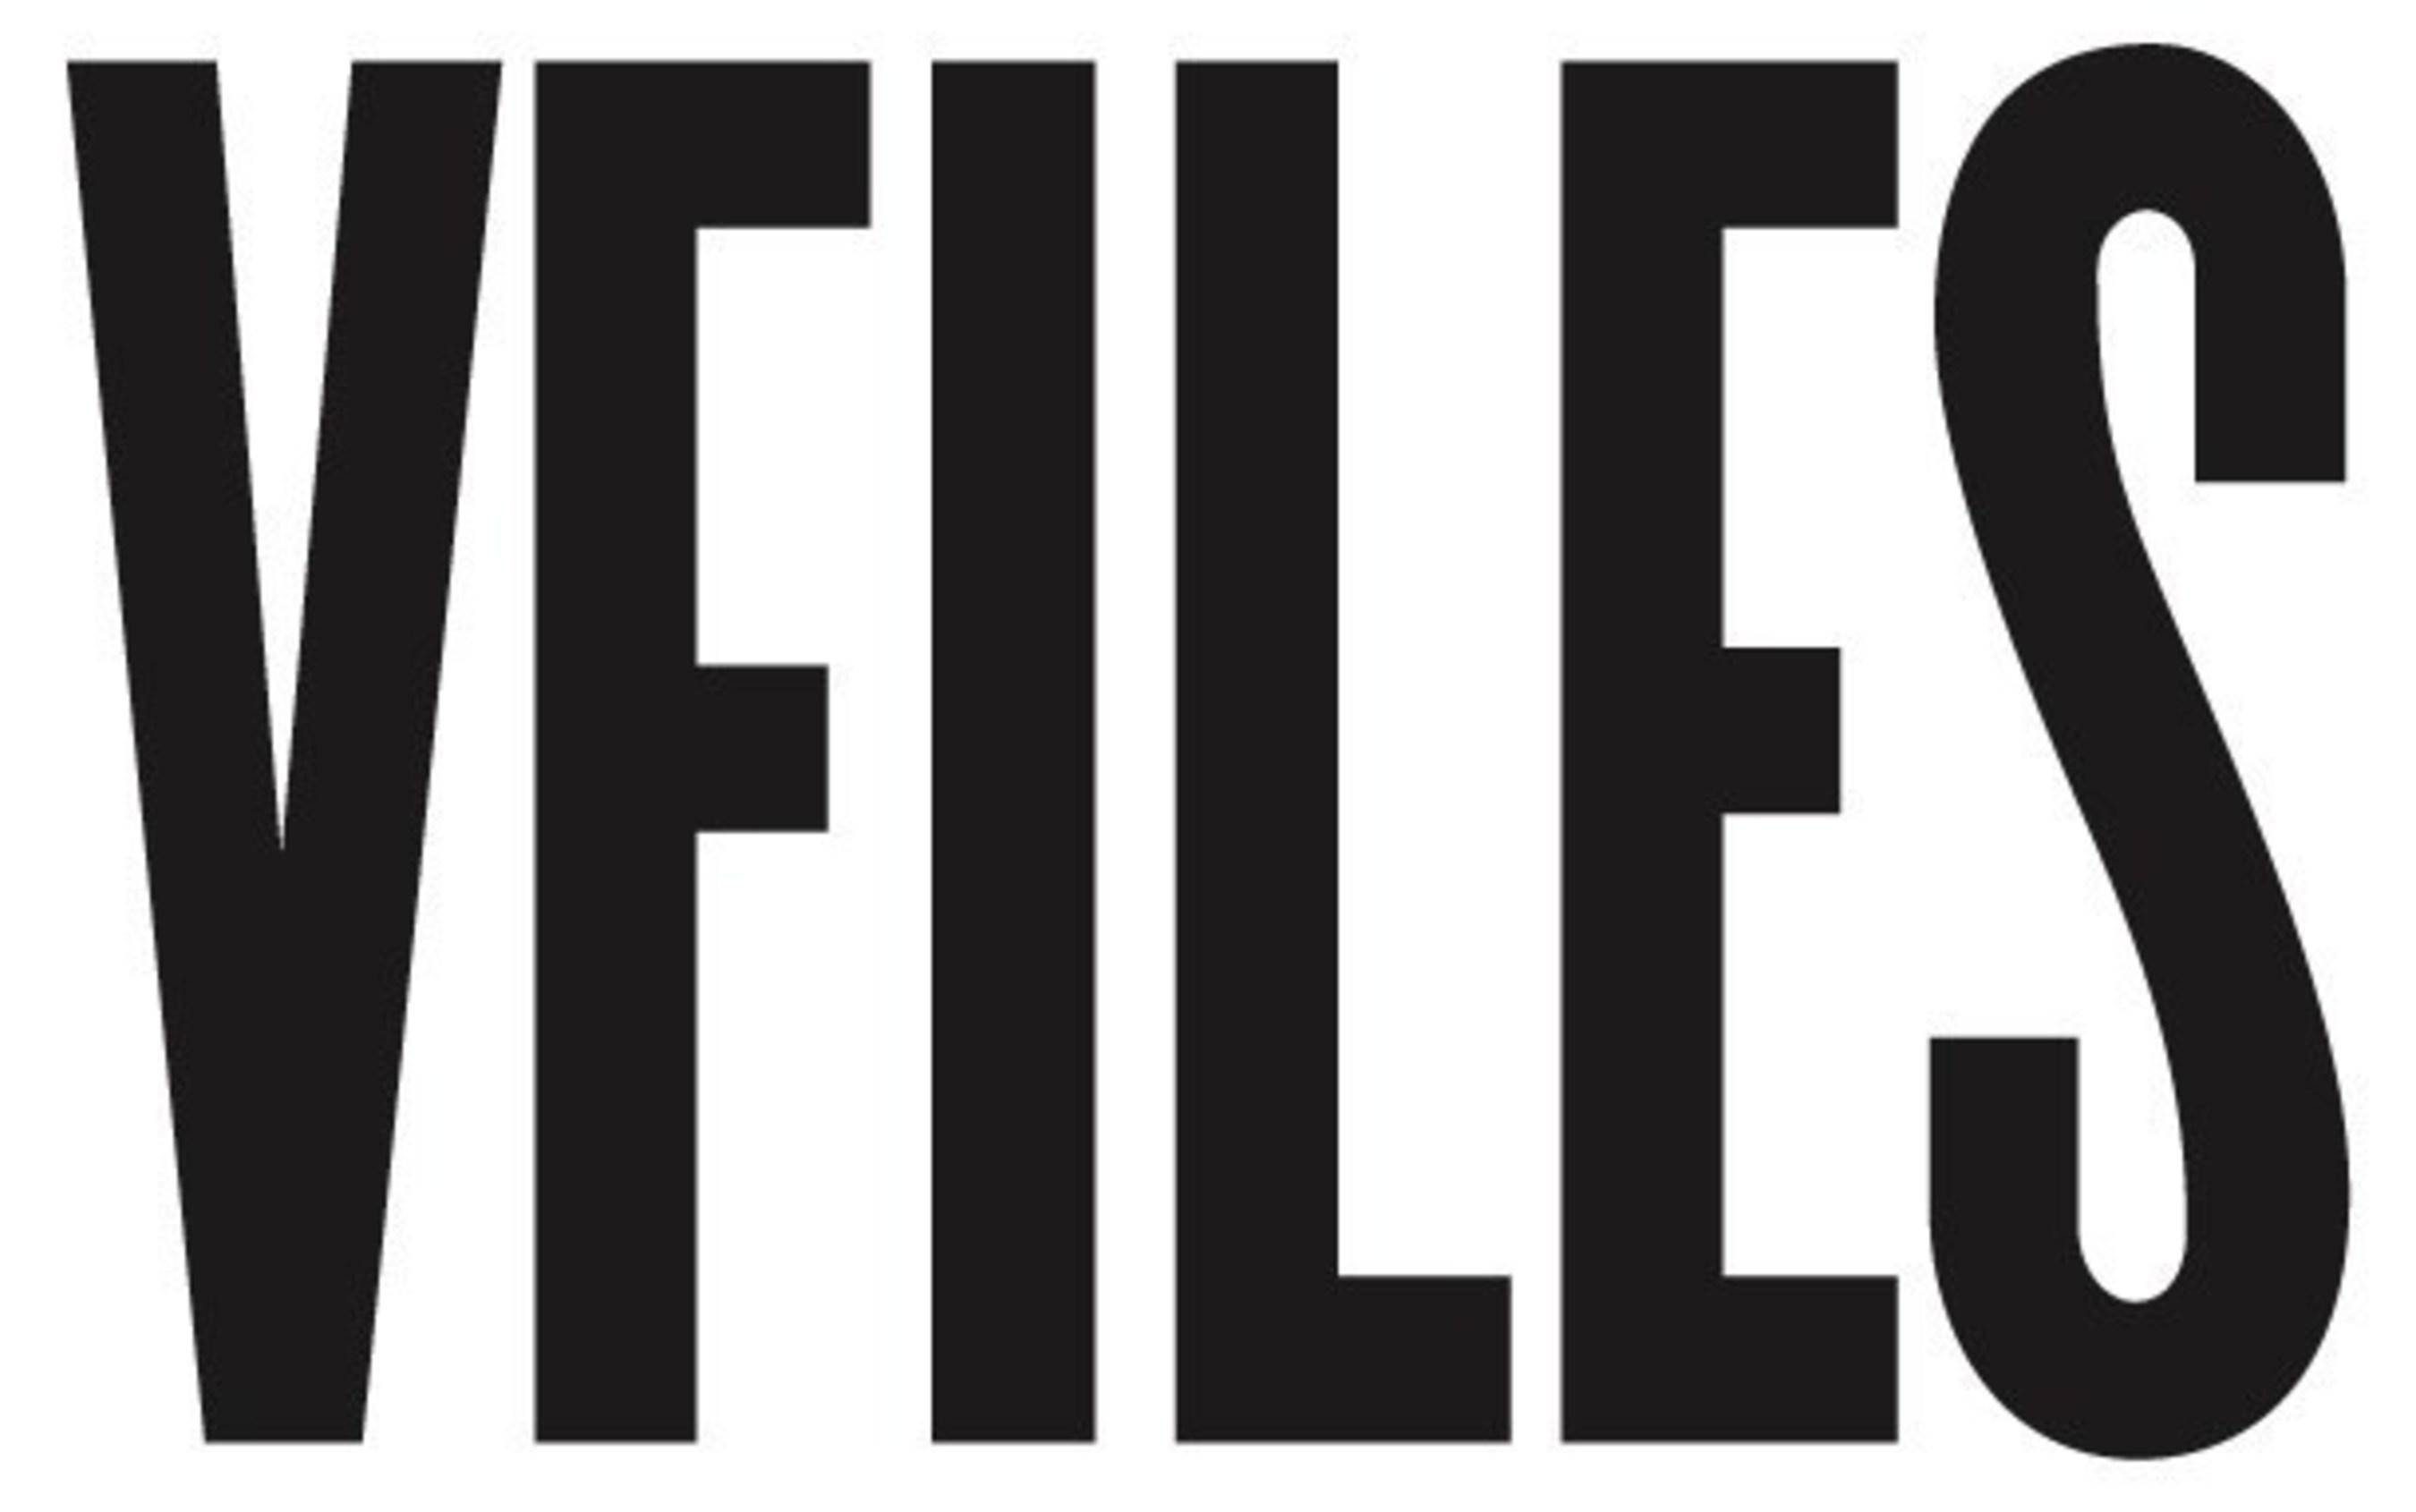 VFILES Launches 2.0 Platform